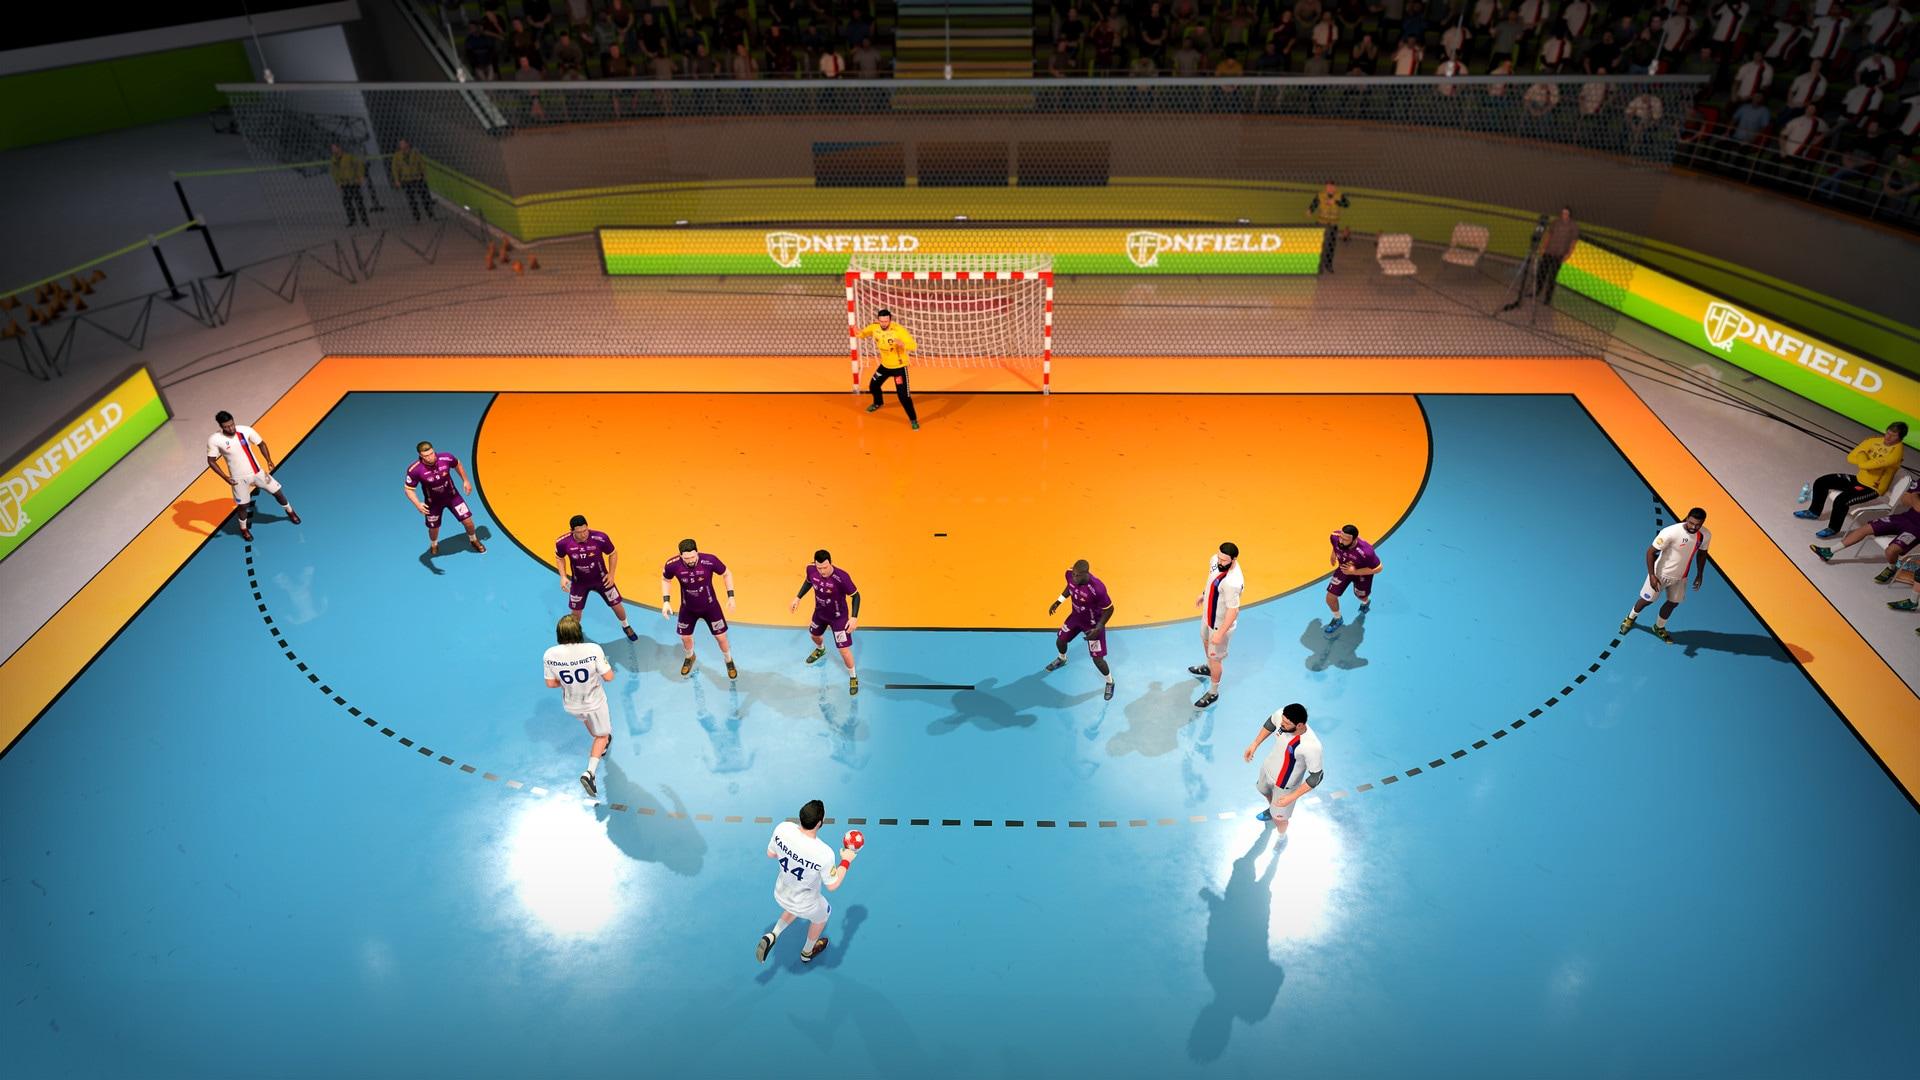 Handball 21 (PC) - Steam Gift - GLOBAL - 3